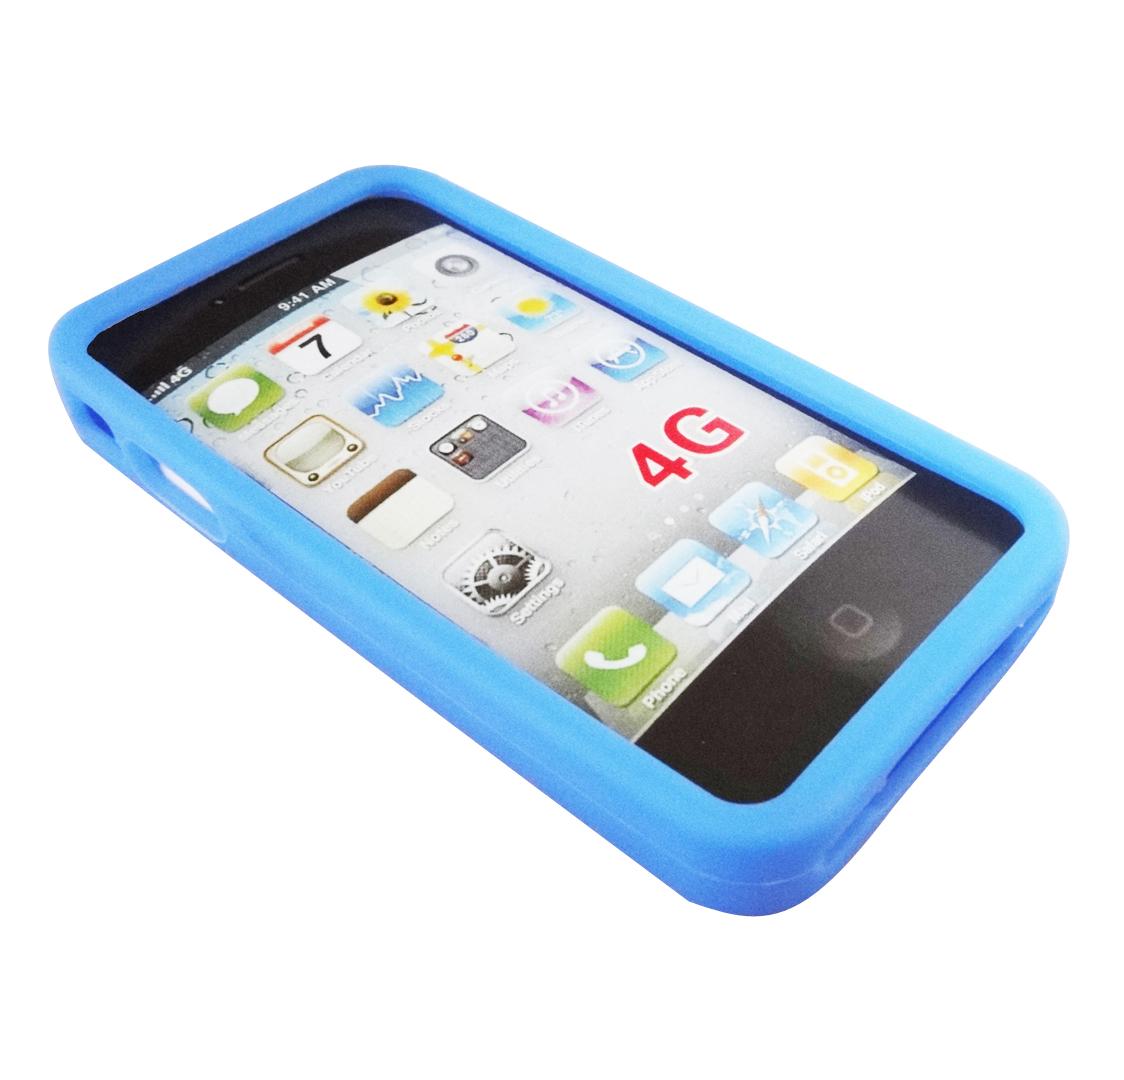 coque iphone 4 calculatrice bleu coque iphone. Black Bedroom Furniture Sets. Home Design Ideas